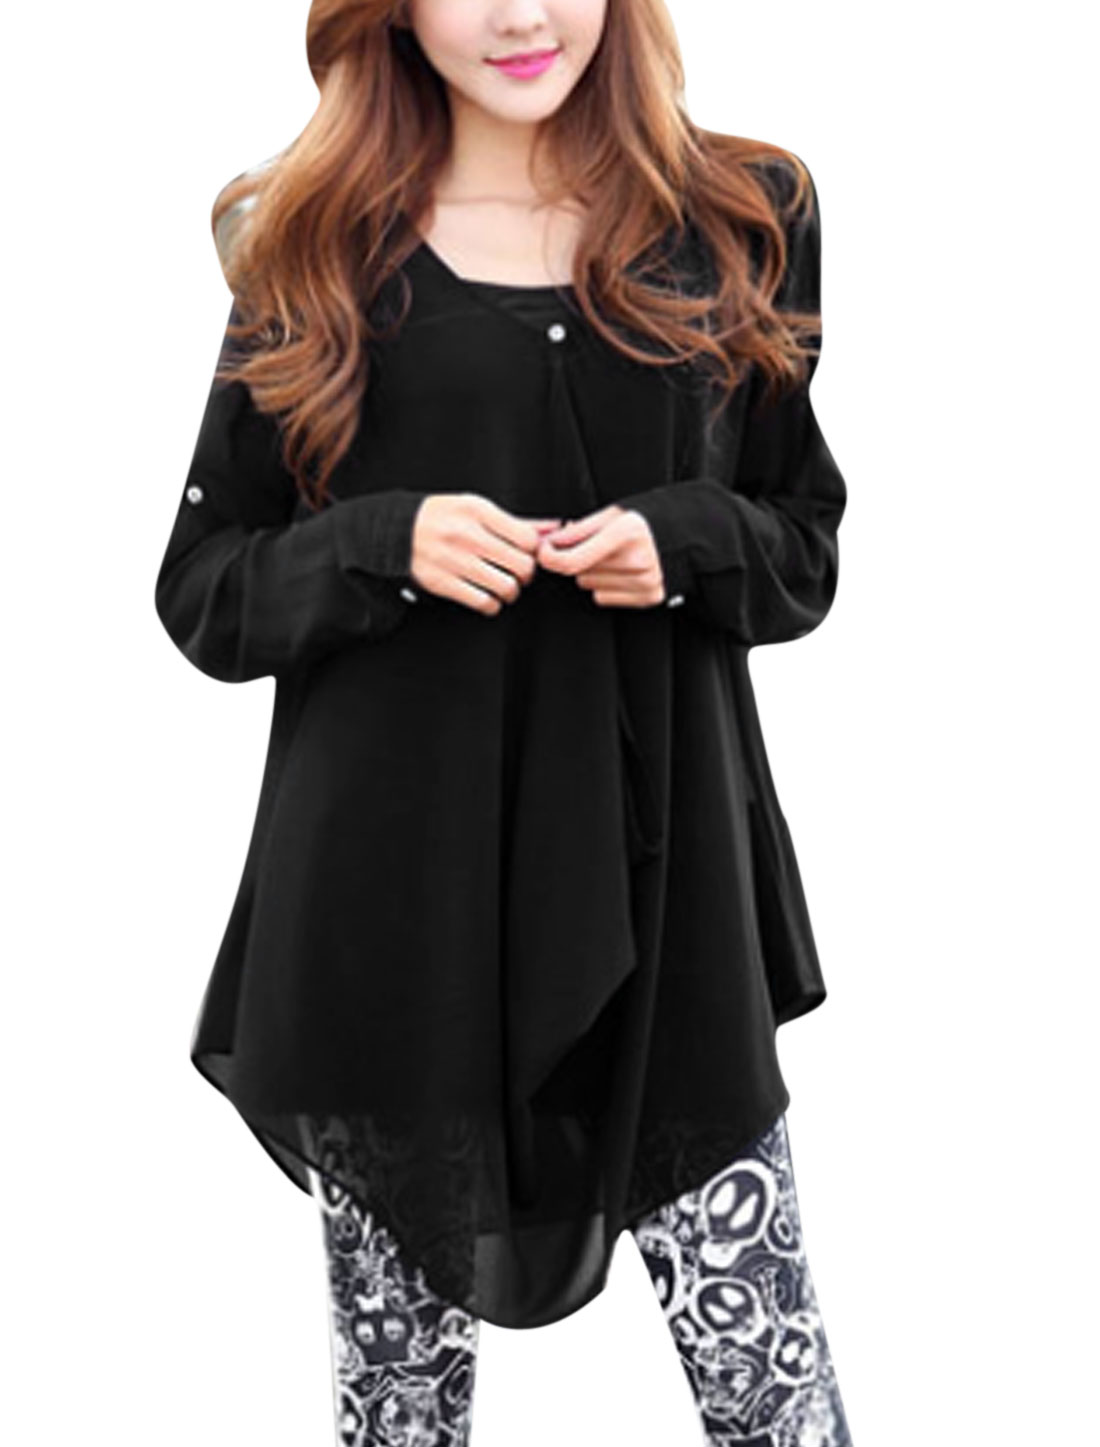 Women Spaghetti Straps Black Cami w Draped Design Front Soft Chiffon Tunic Shirt Black XS